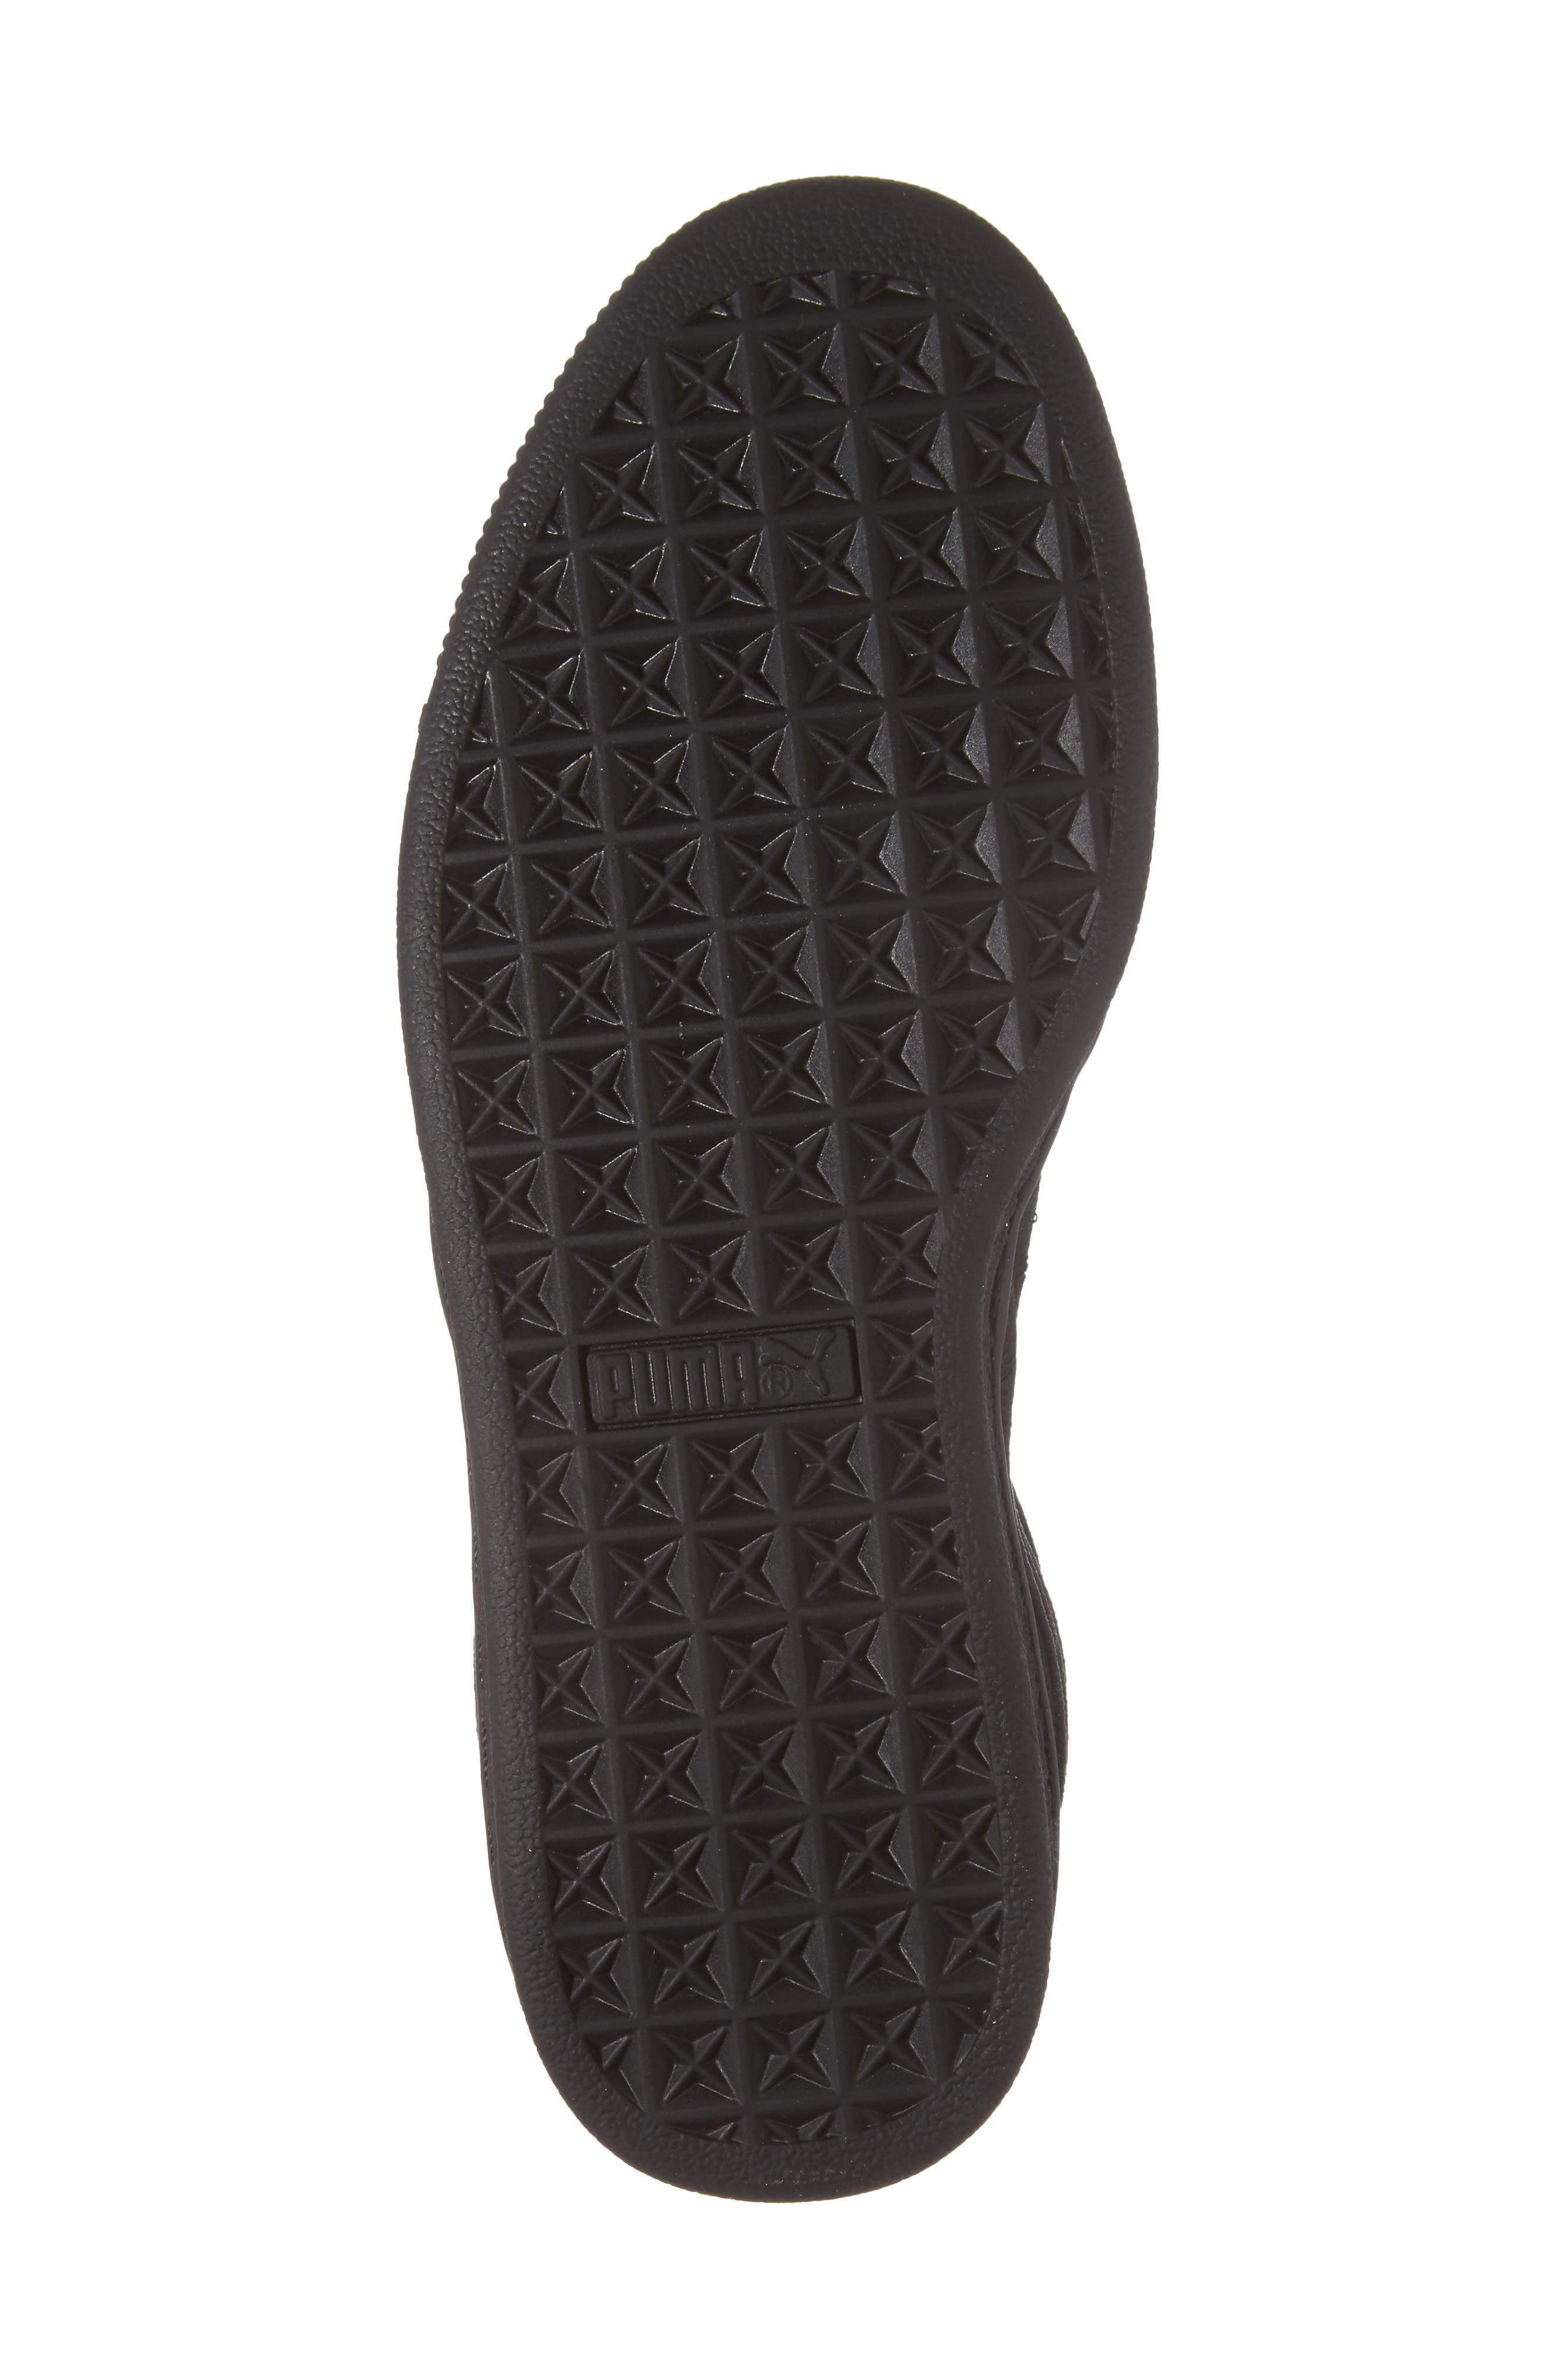 Suede Classic Badge Jr. Sneaker,                             Alternate thumbnail 6, color,                             Black/ Black